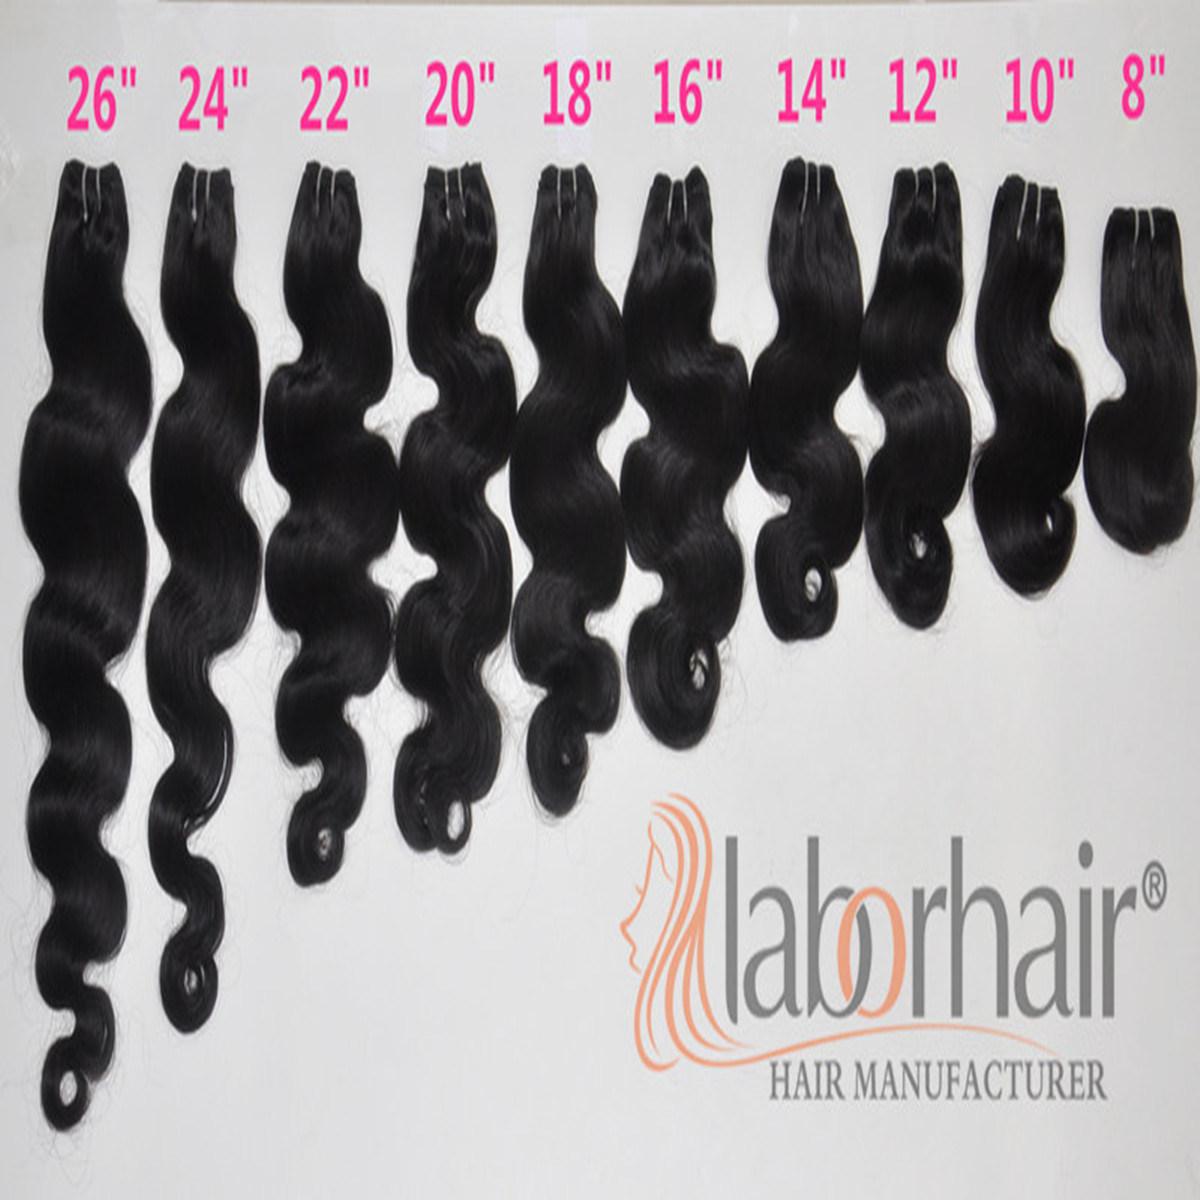 Labor Hair Products Brazilian Body Wave Hair Extension, 9A Brazilian Virgin Hair Tangle Free Human Hair Weave Bundles